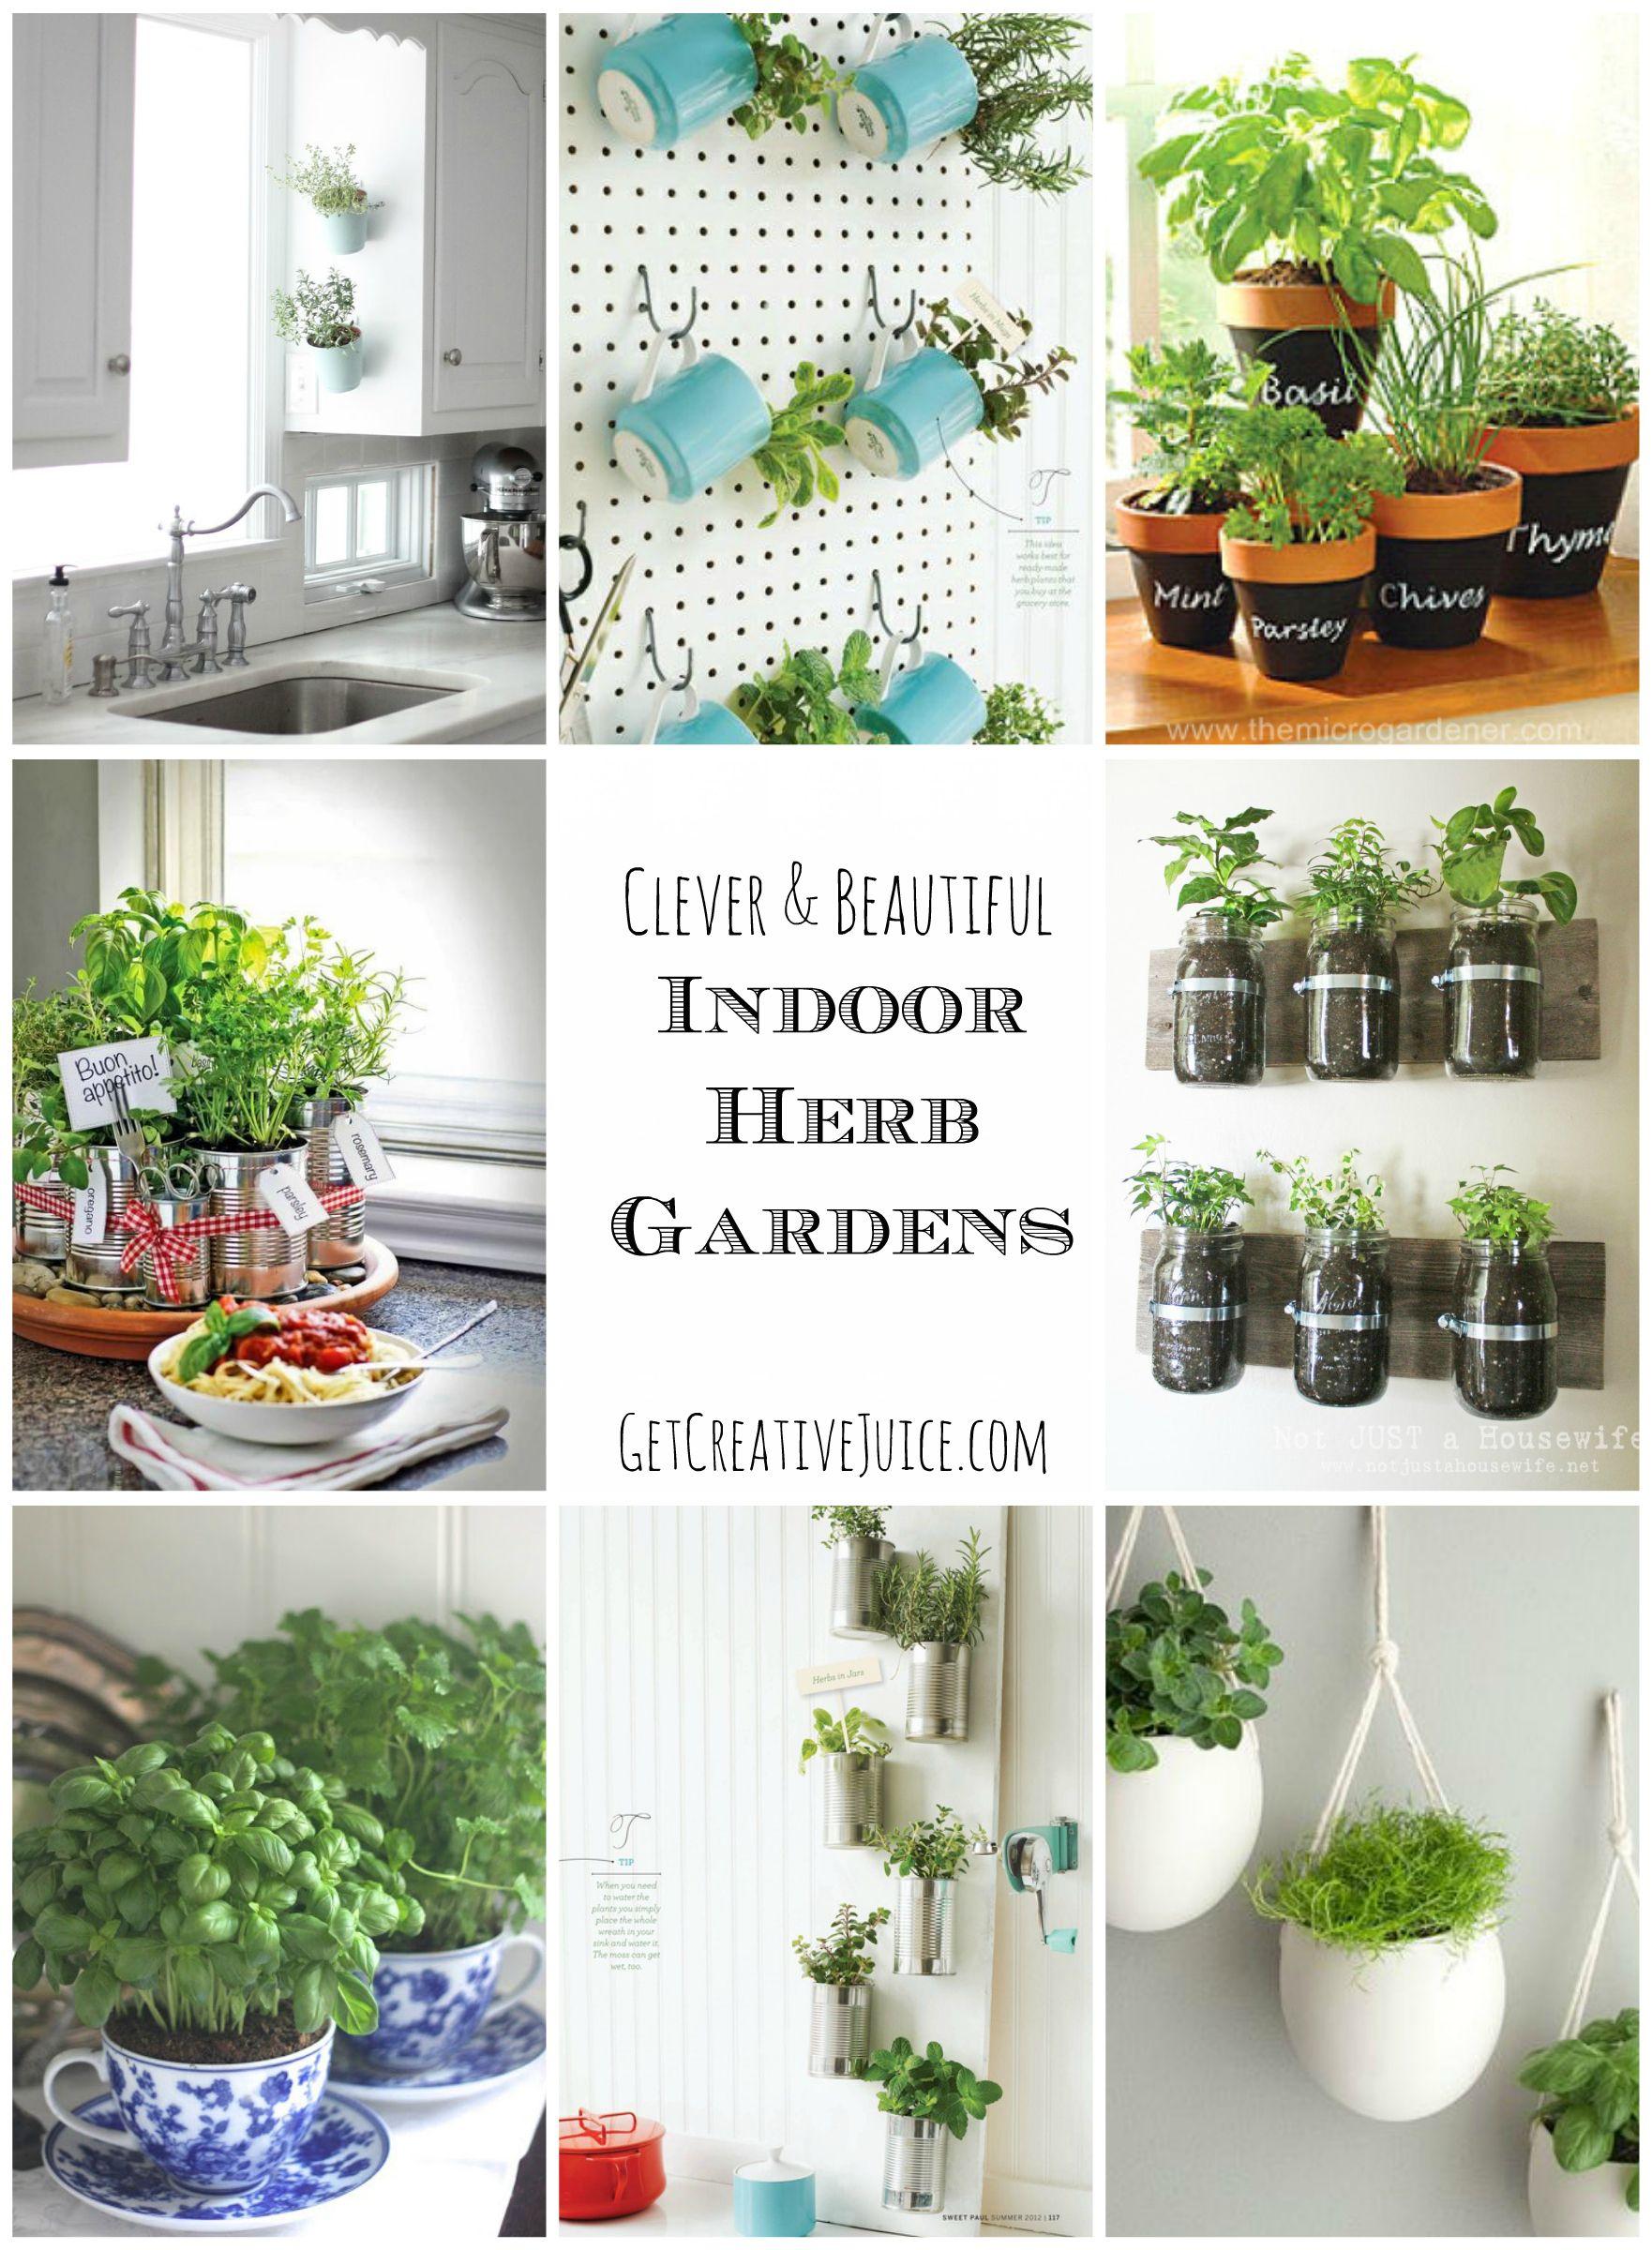 7+ DIY Potted Herb Garden Ideas - Simphome  Indoor herb garden